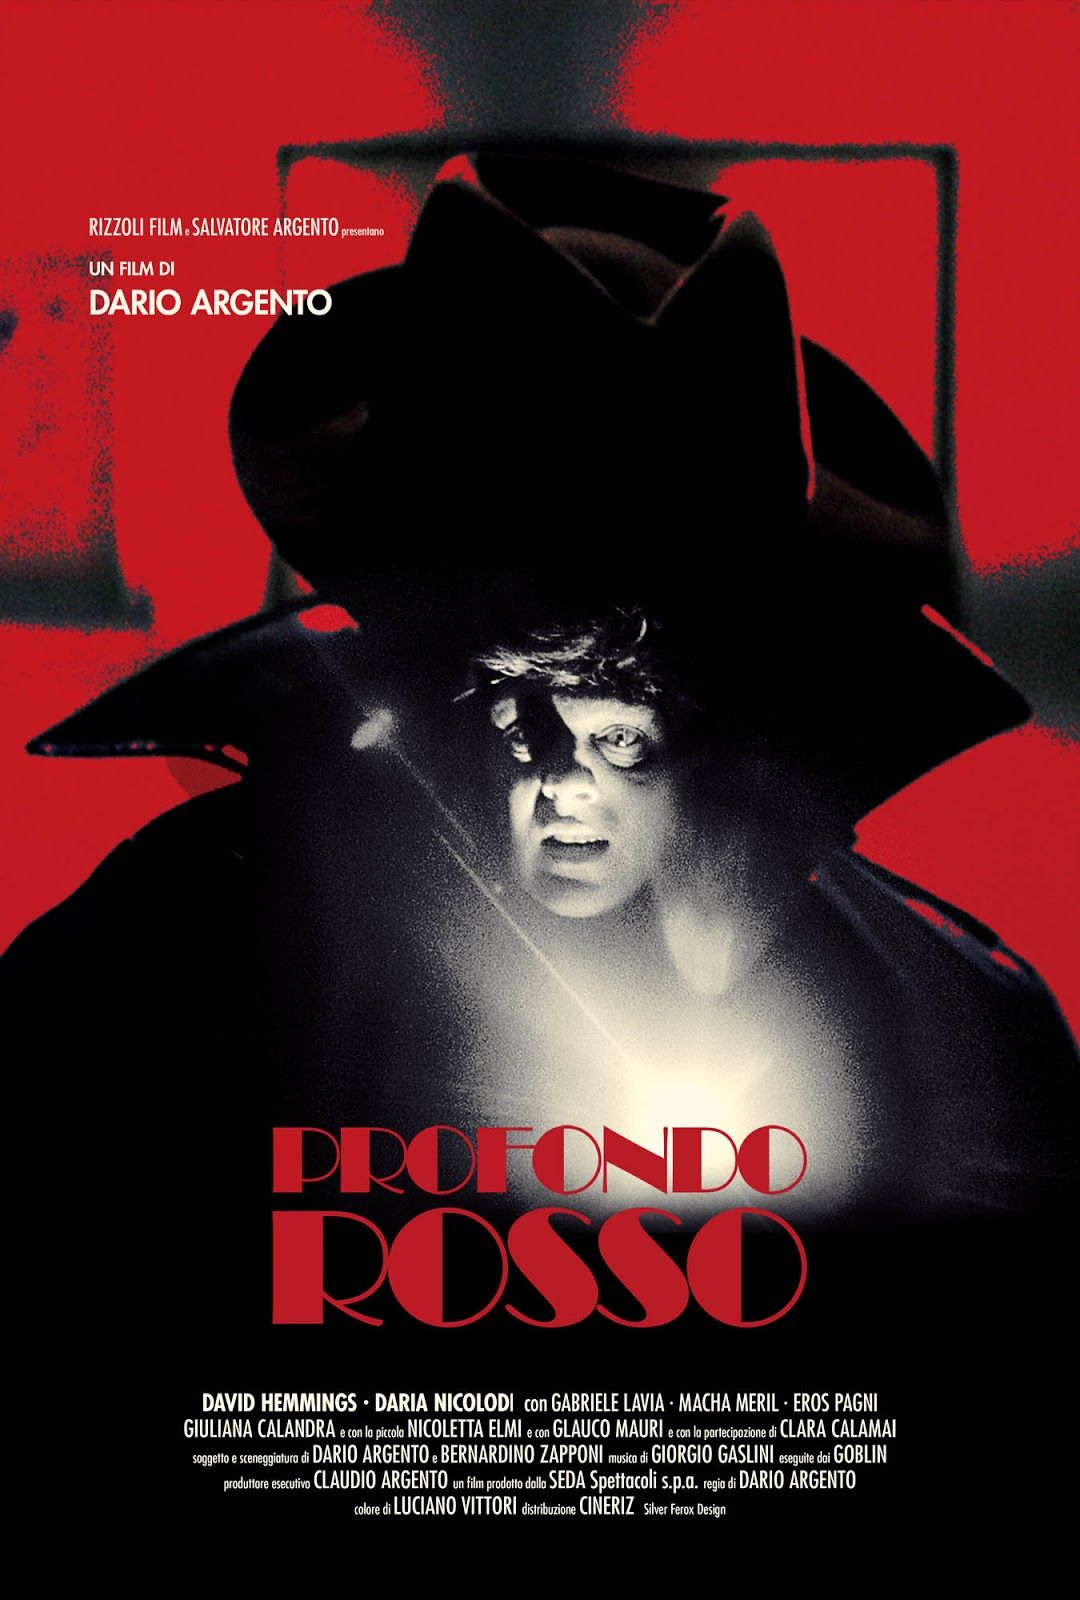 85anti | Horror movie posters, Dario argento, Top horror movies